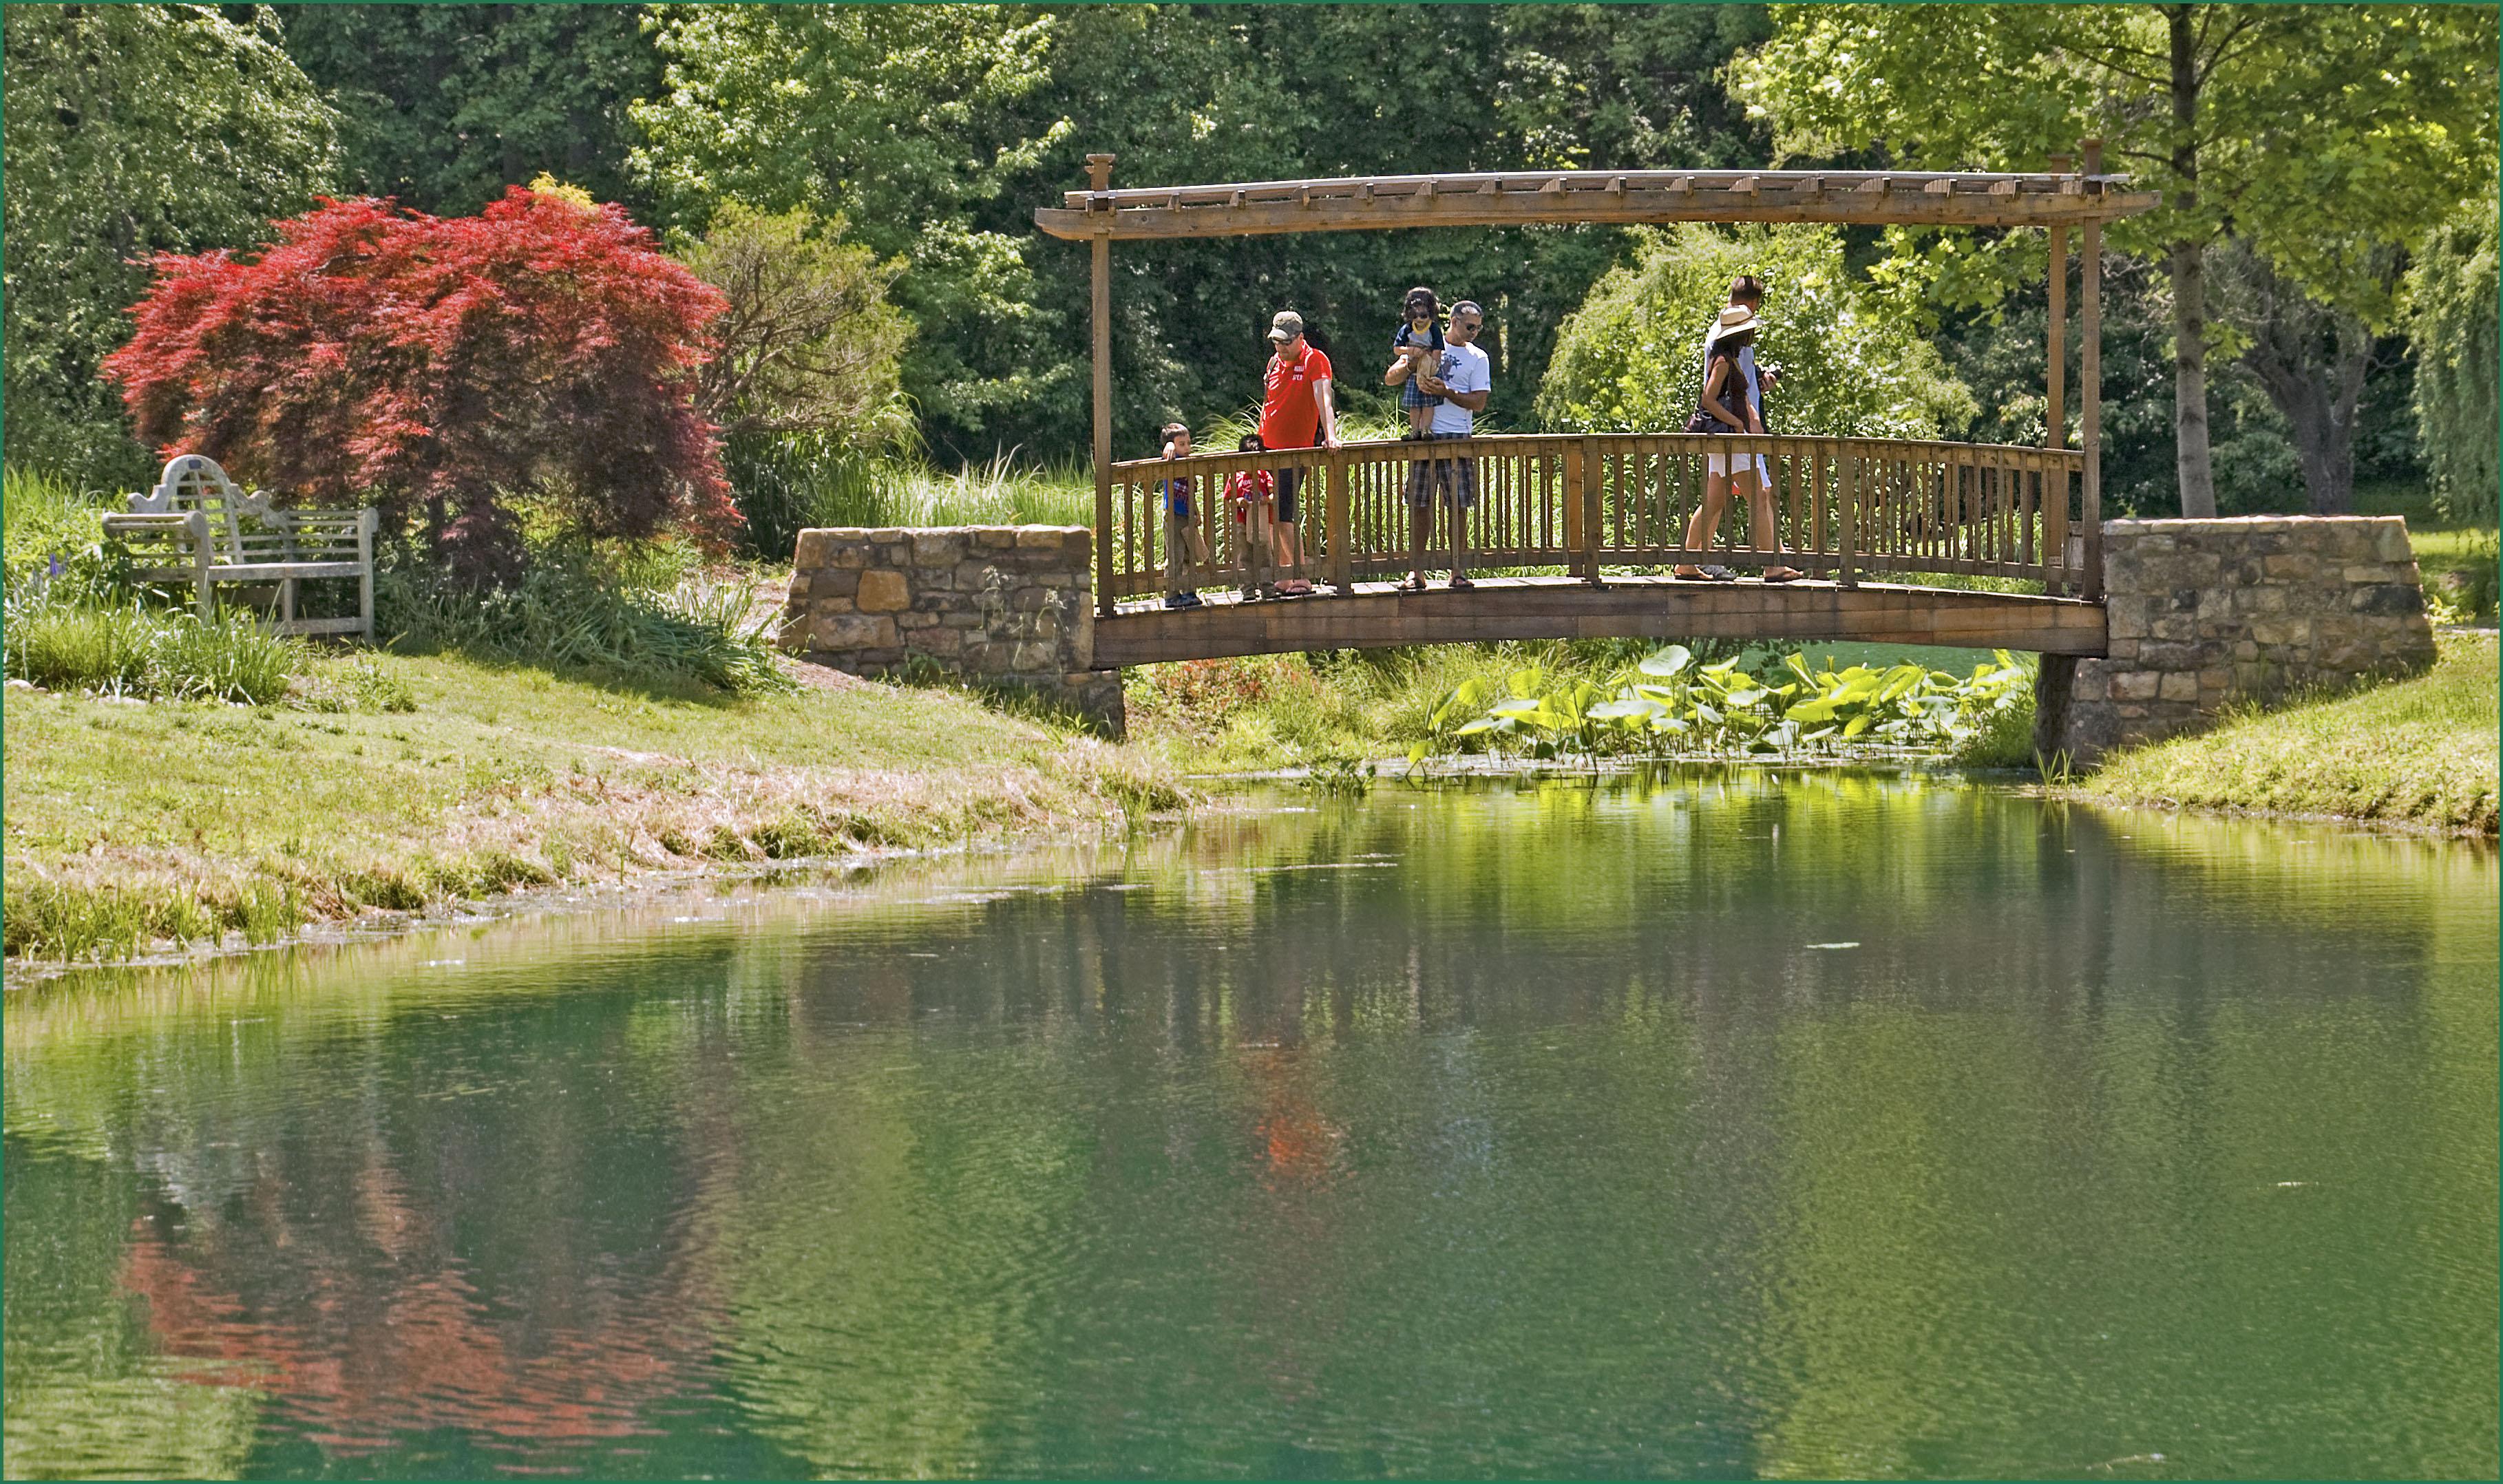 Meadowlark gardens vienna va hours garden ftempo Country gardens nursing home swansea ma